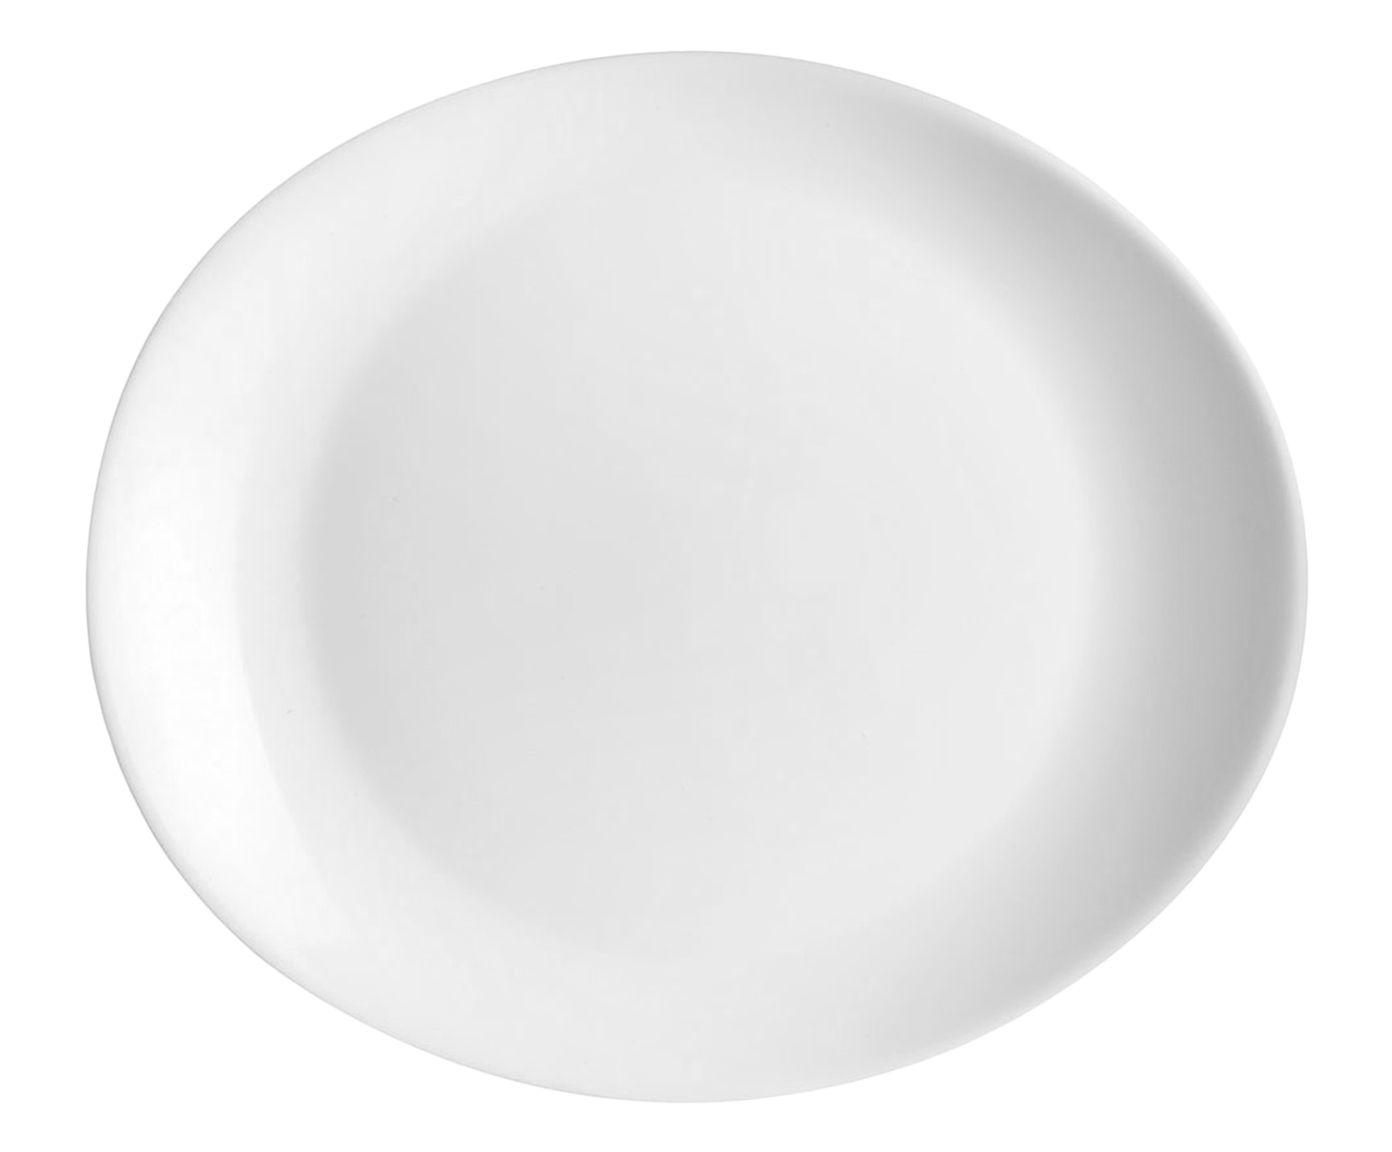 Prato para Steak Friends Branco - 30X3X26cm | Westwing.com.br